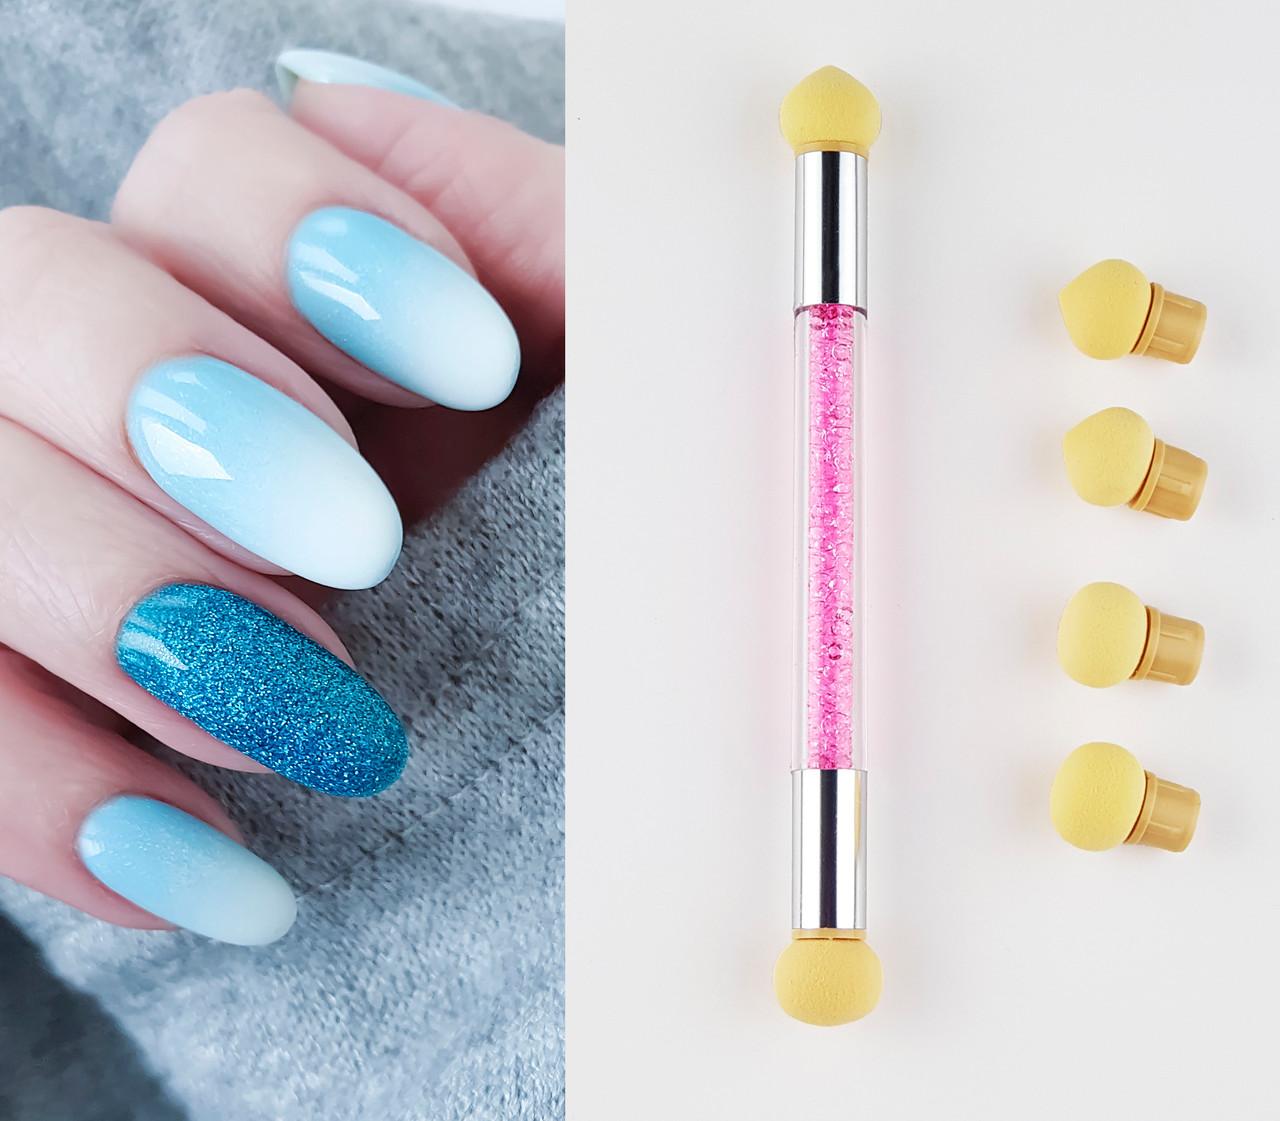 Dual Head Nail Art Sponge Pen Ombre Colour Shading Tool 6 Heads